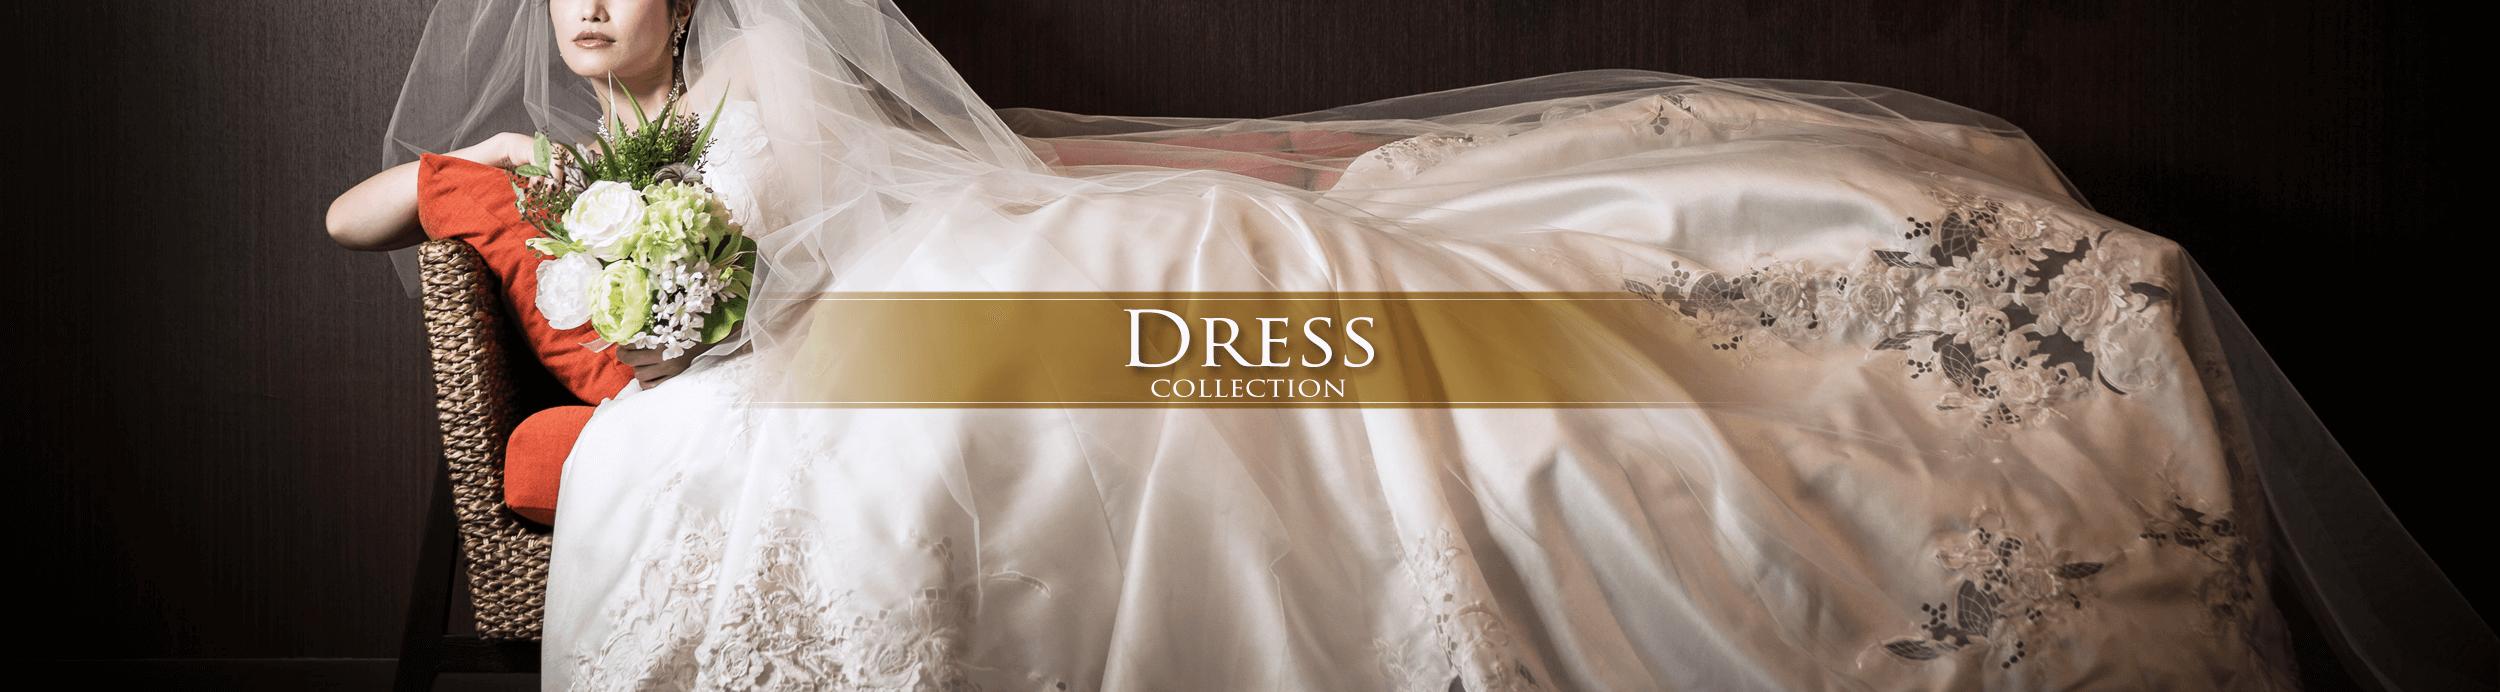 DRESS-collection|撮影衣装ードレスー